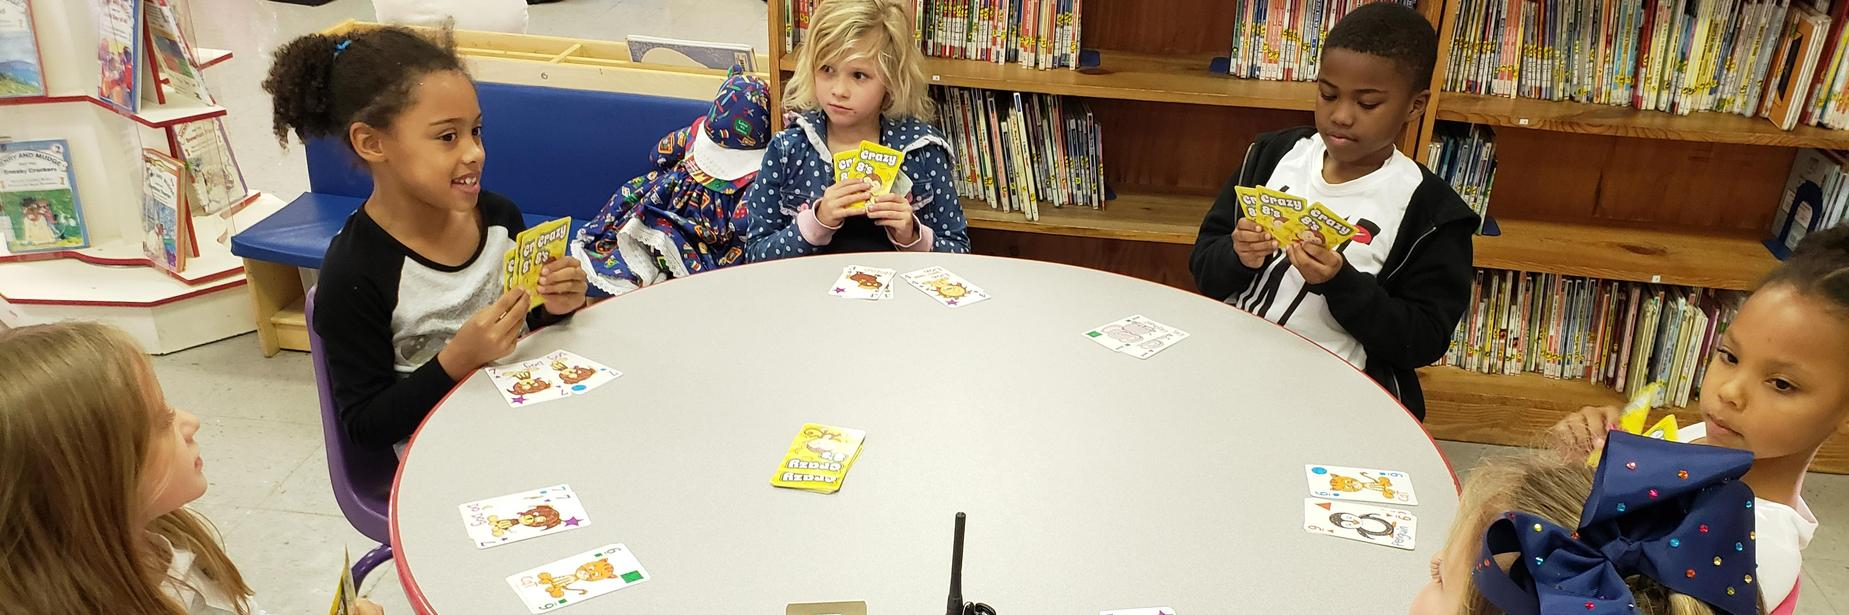 EDC card games